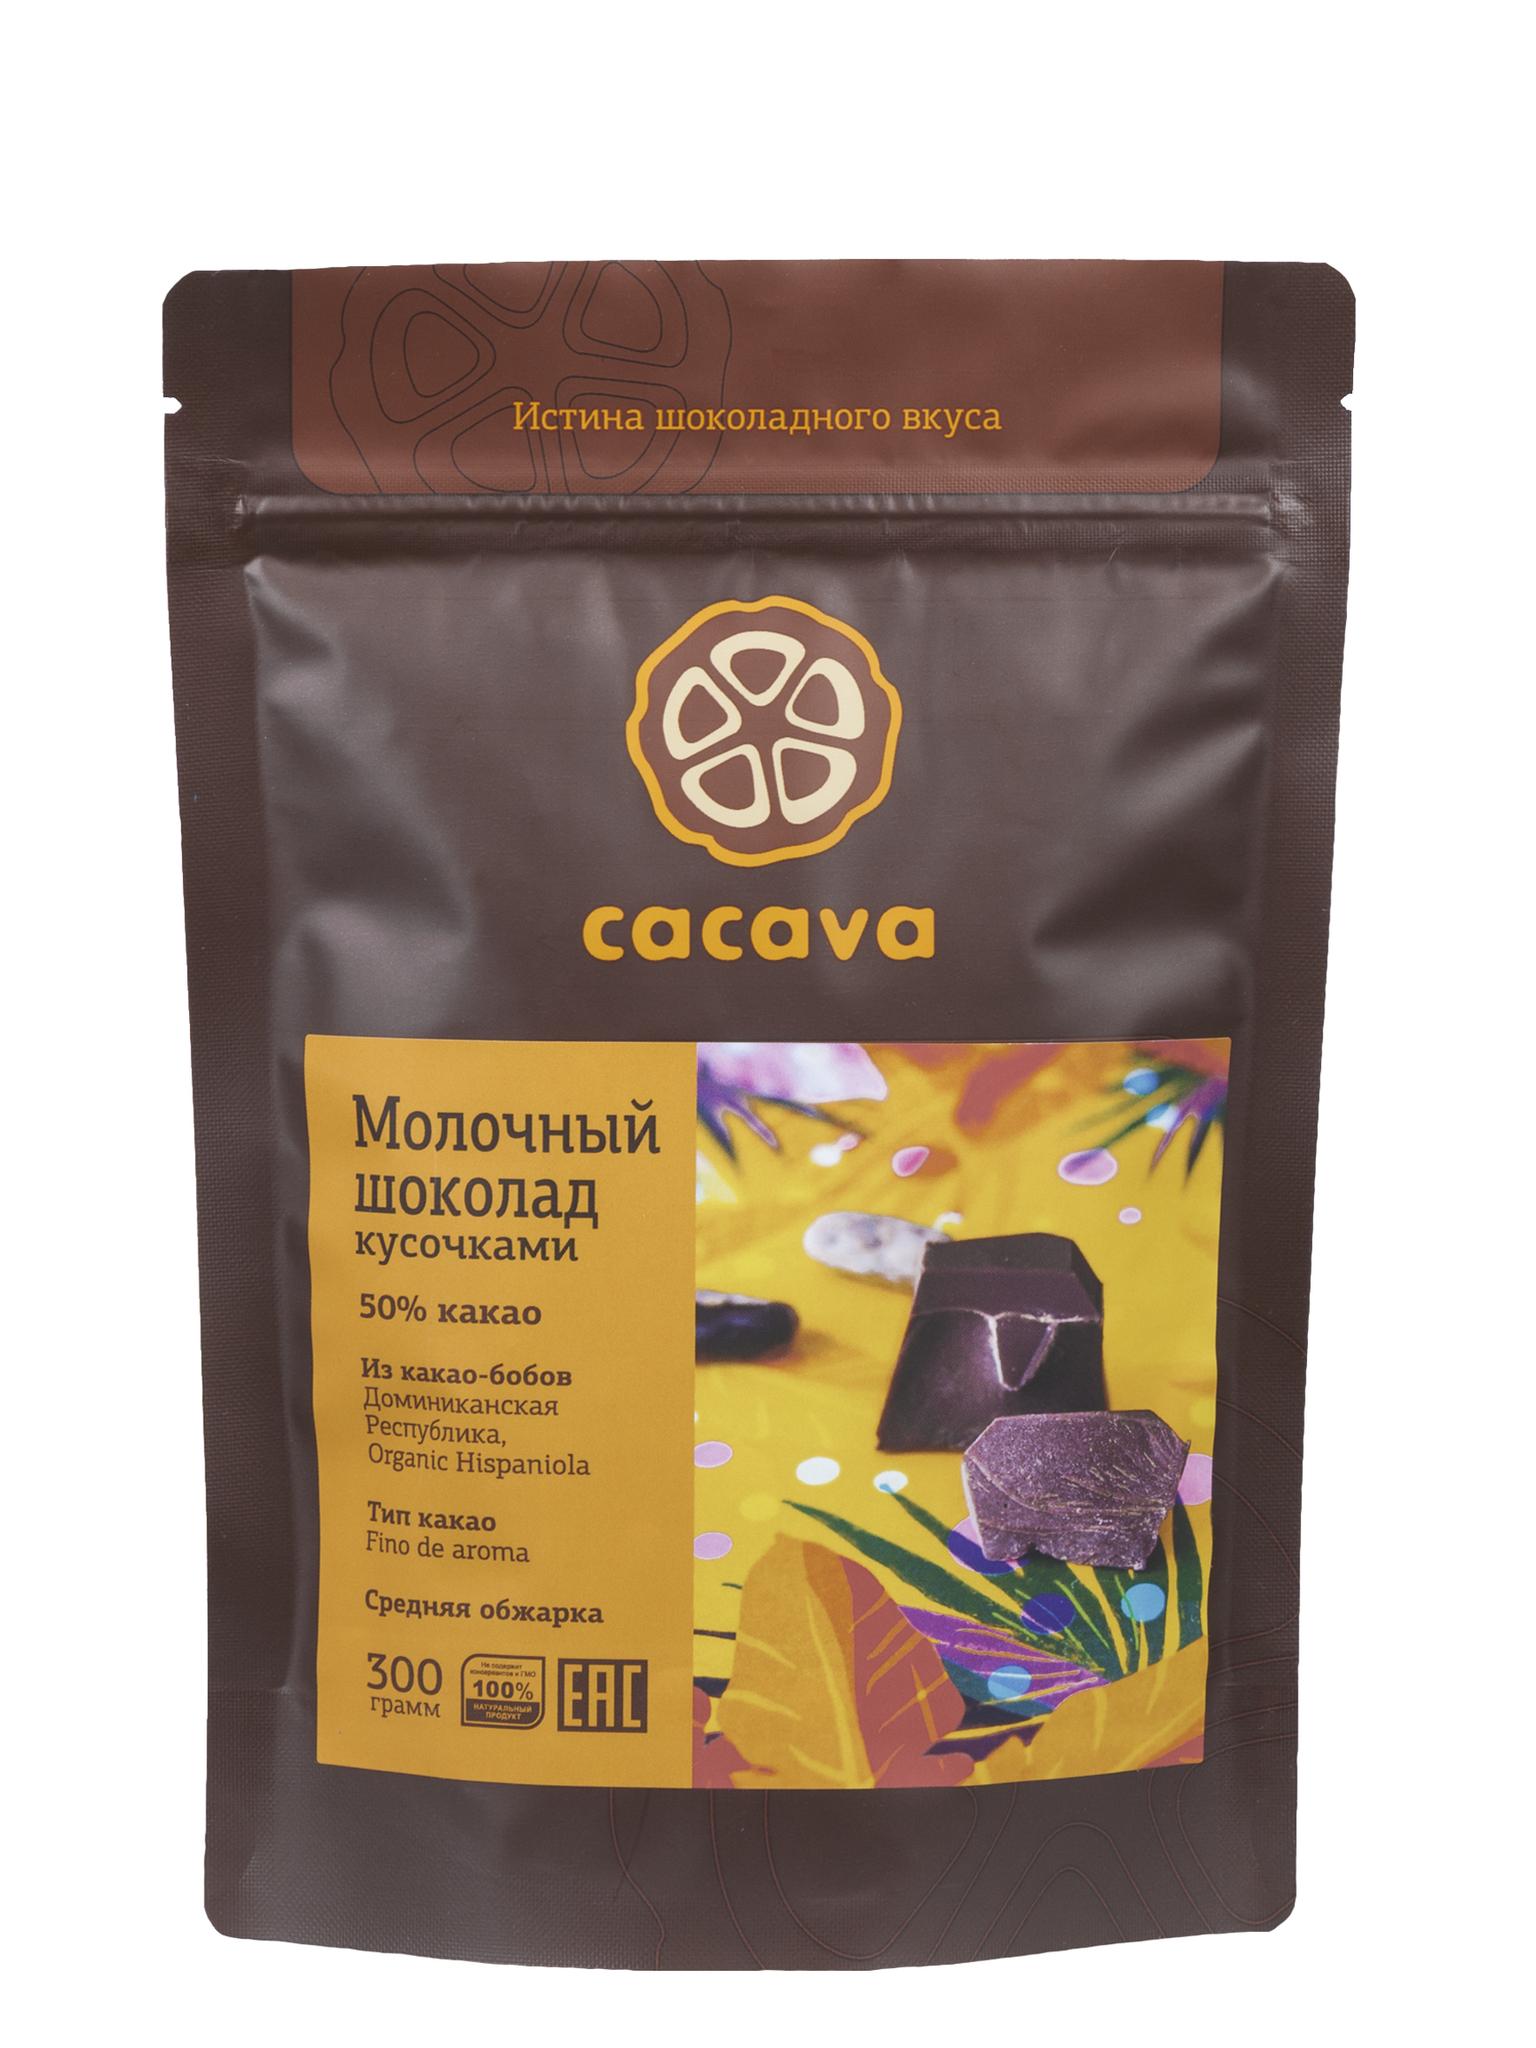 Молочный шоколад 50 % какао (Доминикана), упаковка 300 грамм